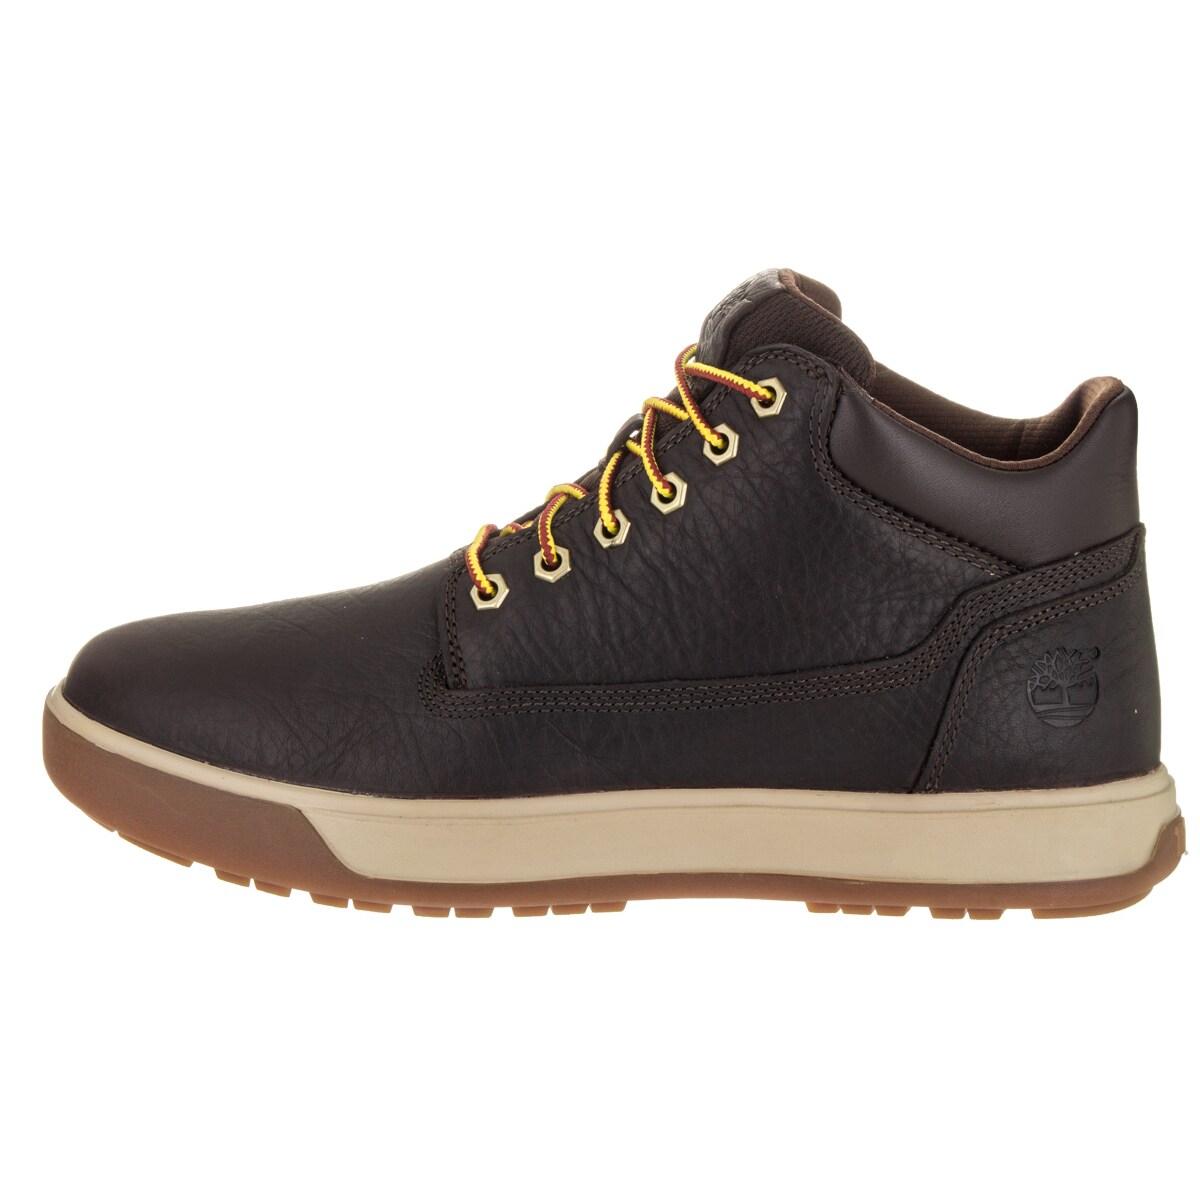 2963a47fd3a Timberland Men's Tenmile Chukka Boots